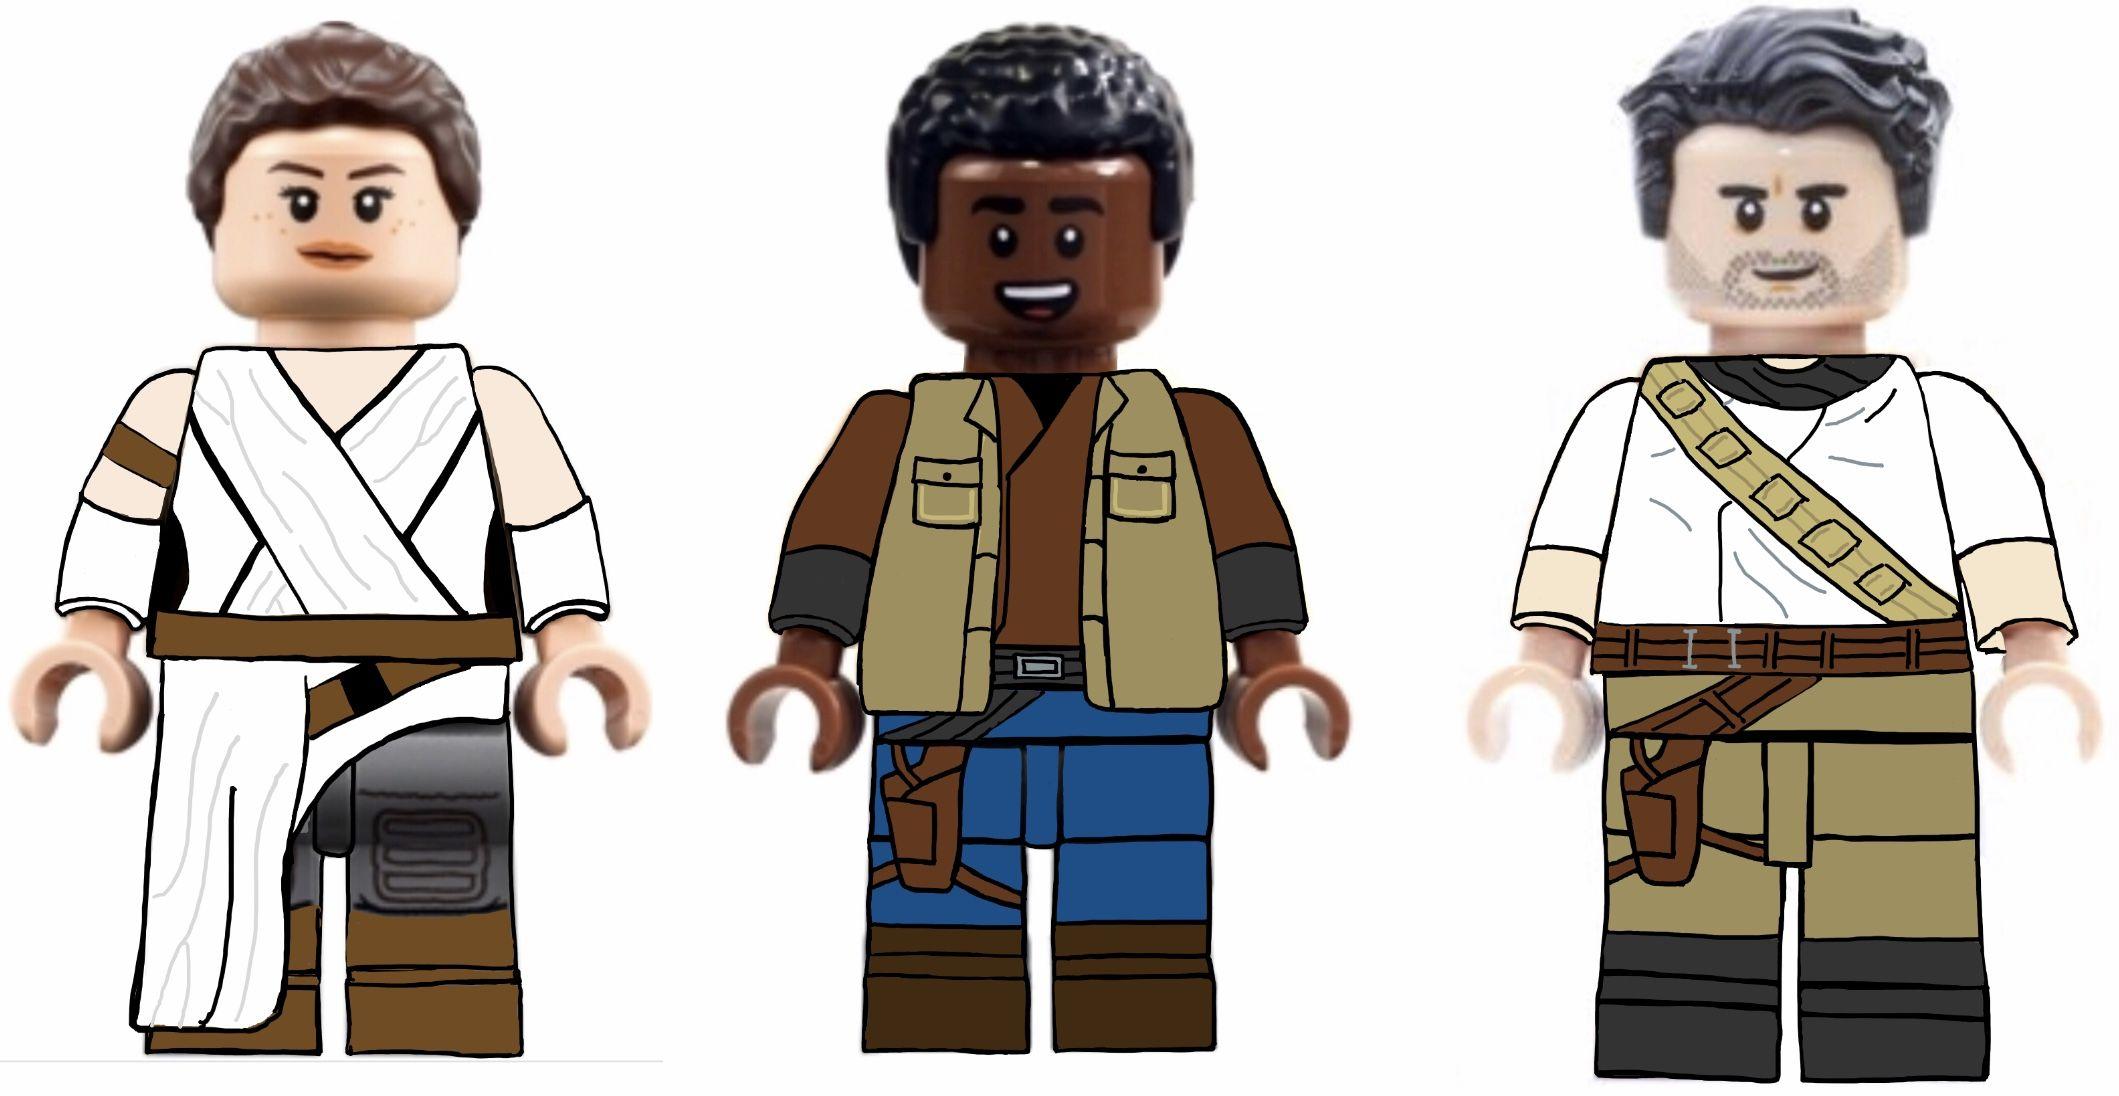 Lego Star Wars The Rise Of Skywalker Lego Star Wars Star Wars Images Stars